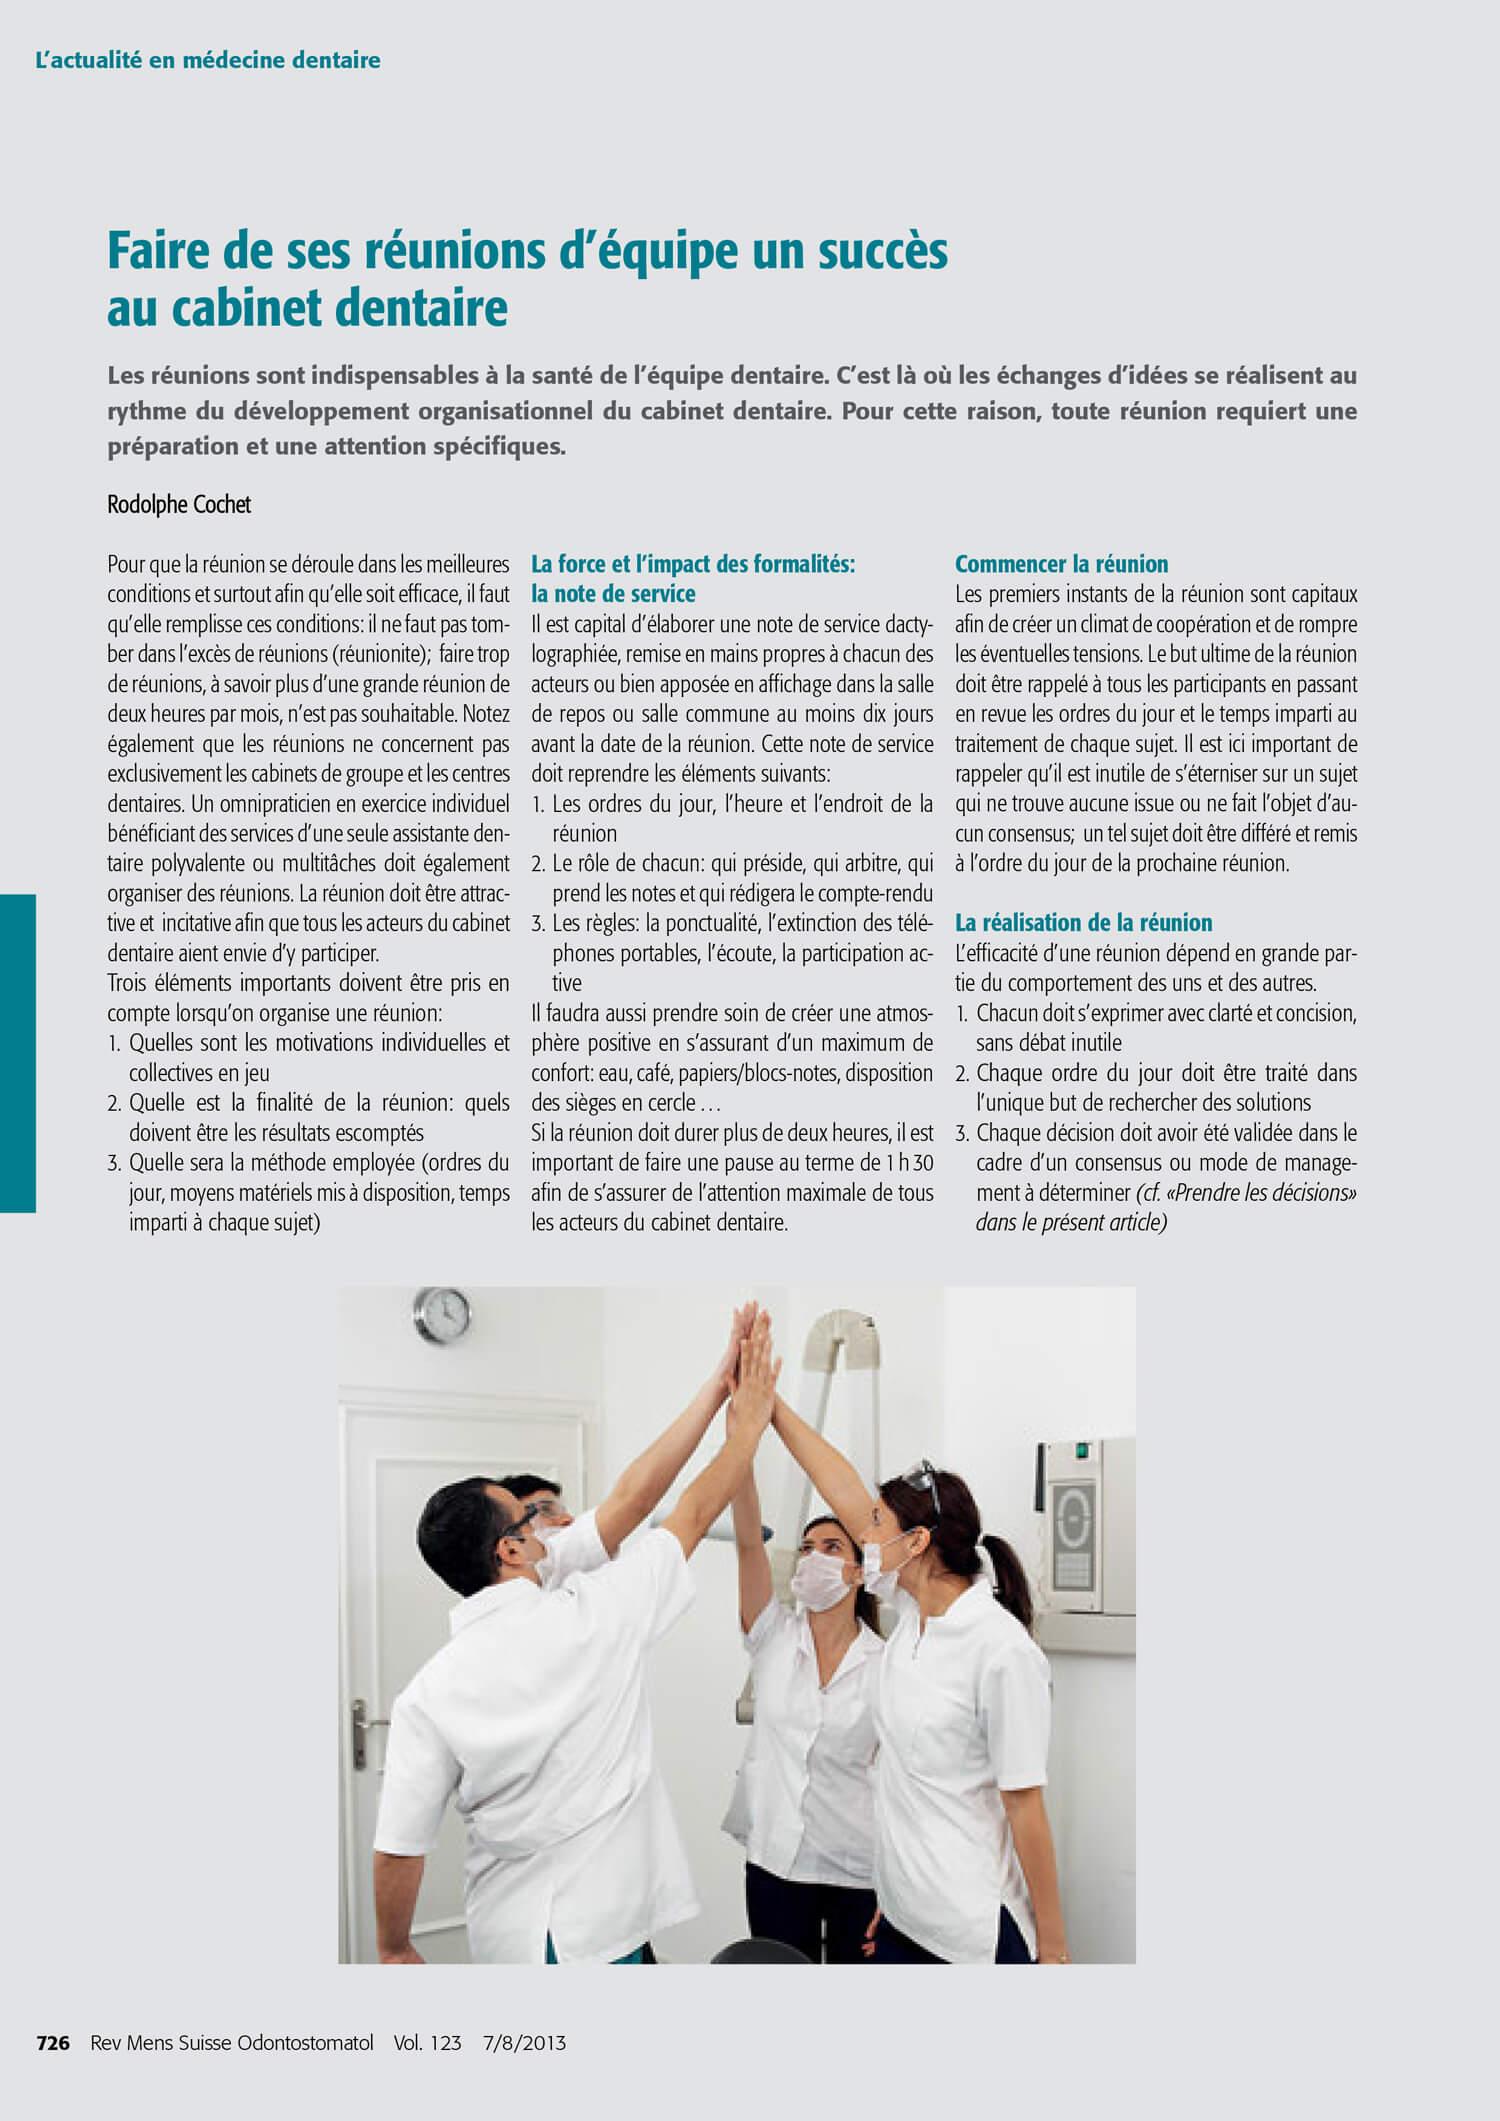 reunion-equipe-succes-cabinet-dentaire-suisse-RMSO-Rodolphe-Cochet.jpg